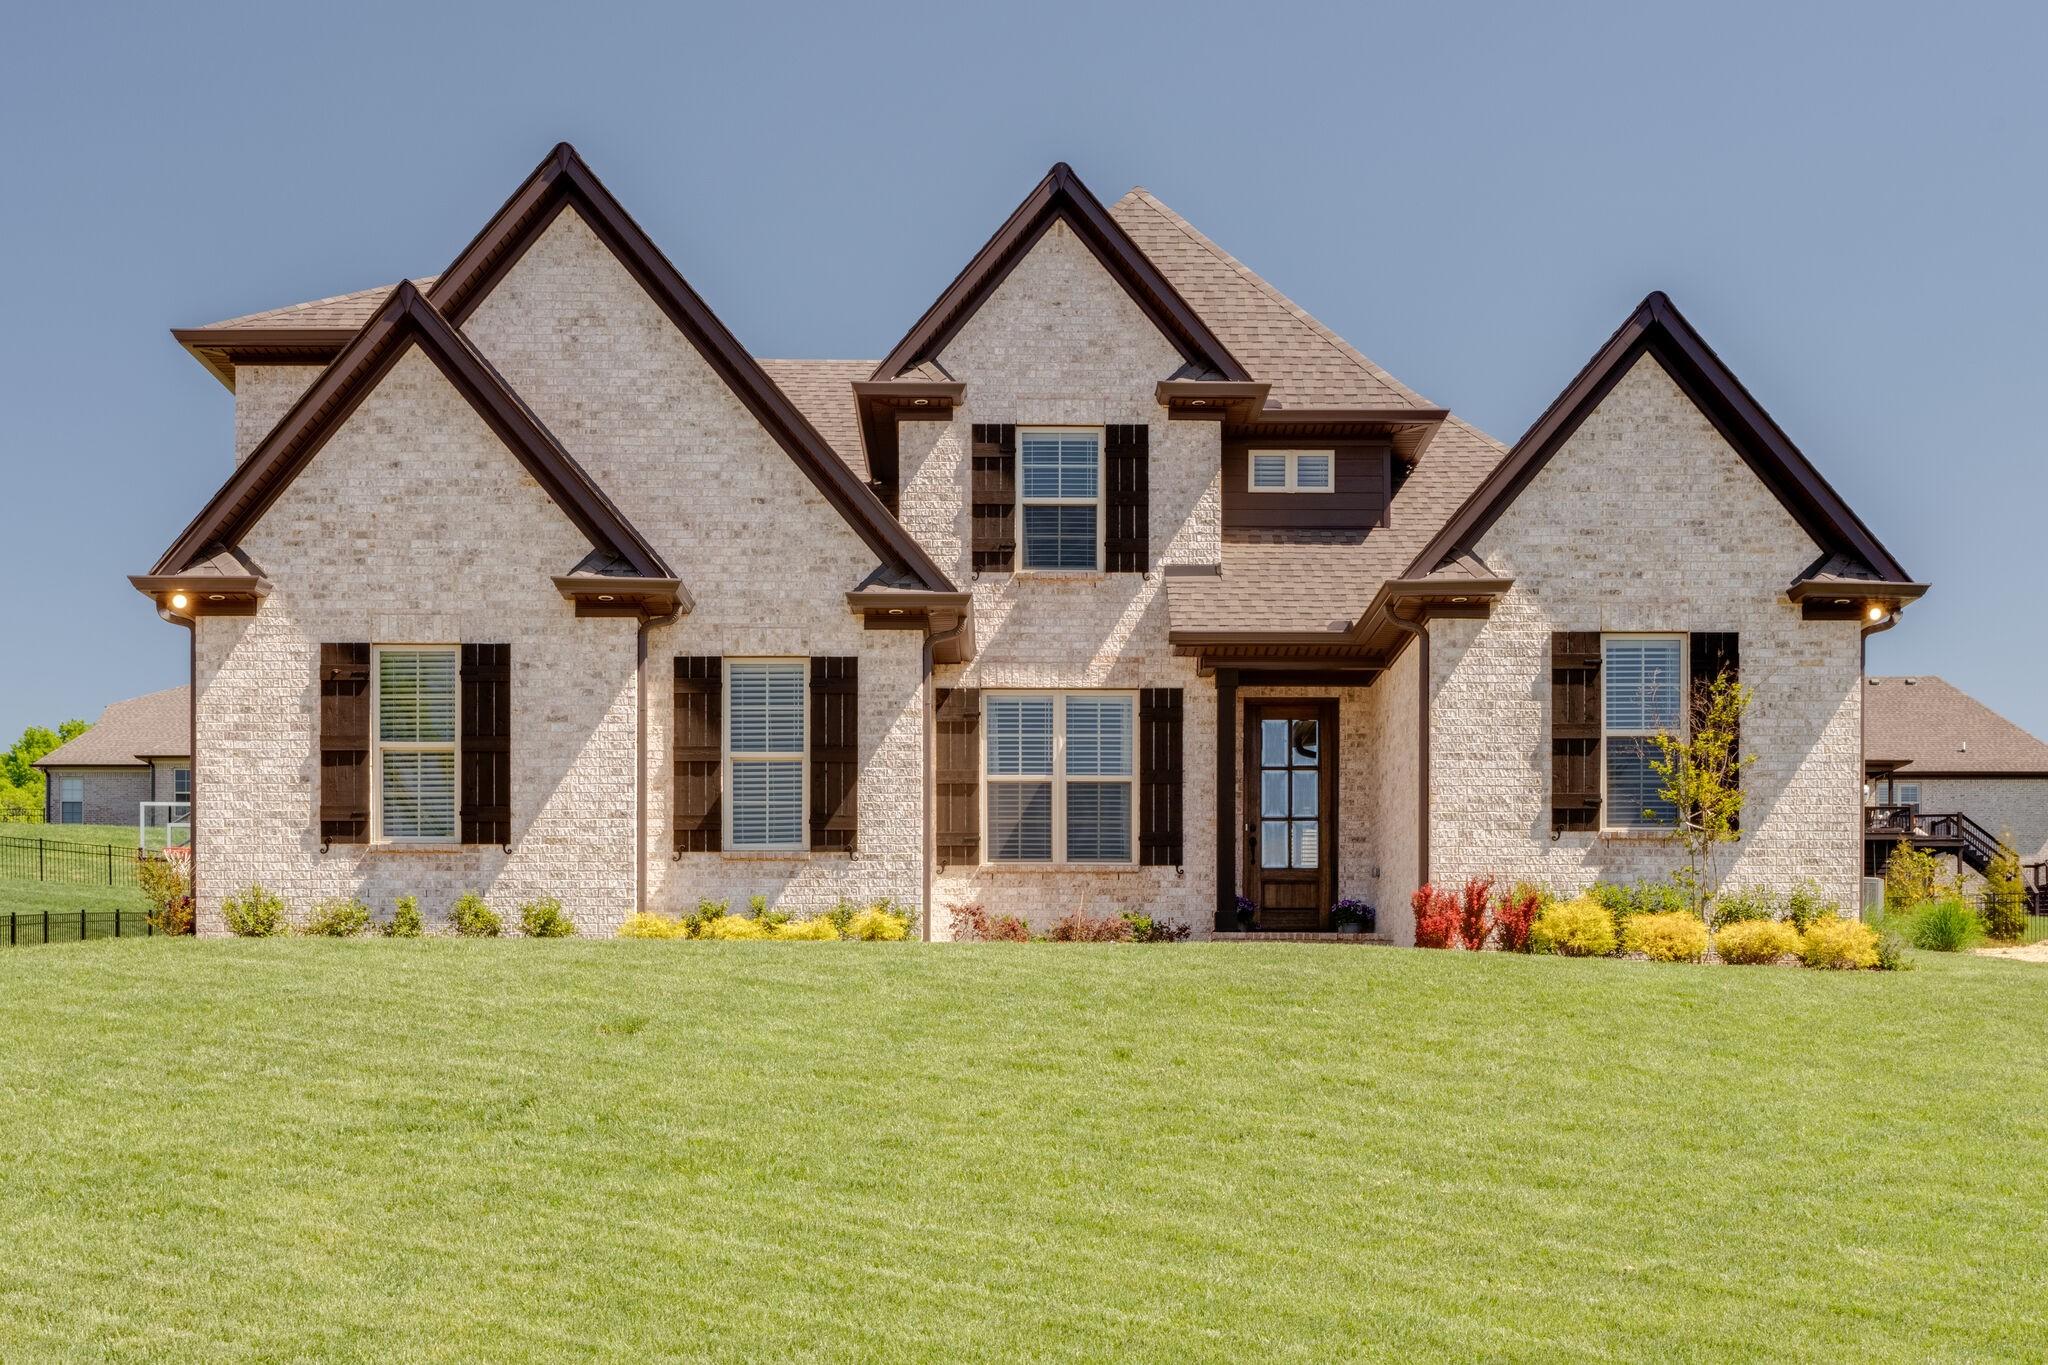 1102 Dorset Dr Property Photo - Hendersonville, TN real estate listing